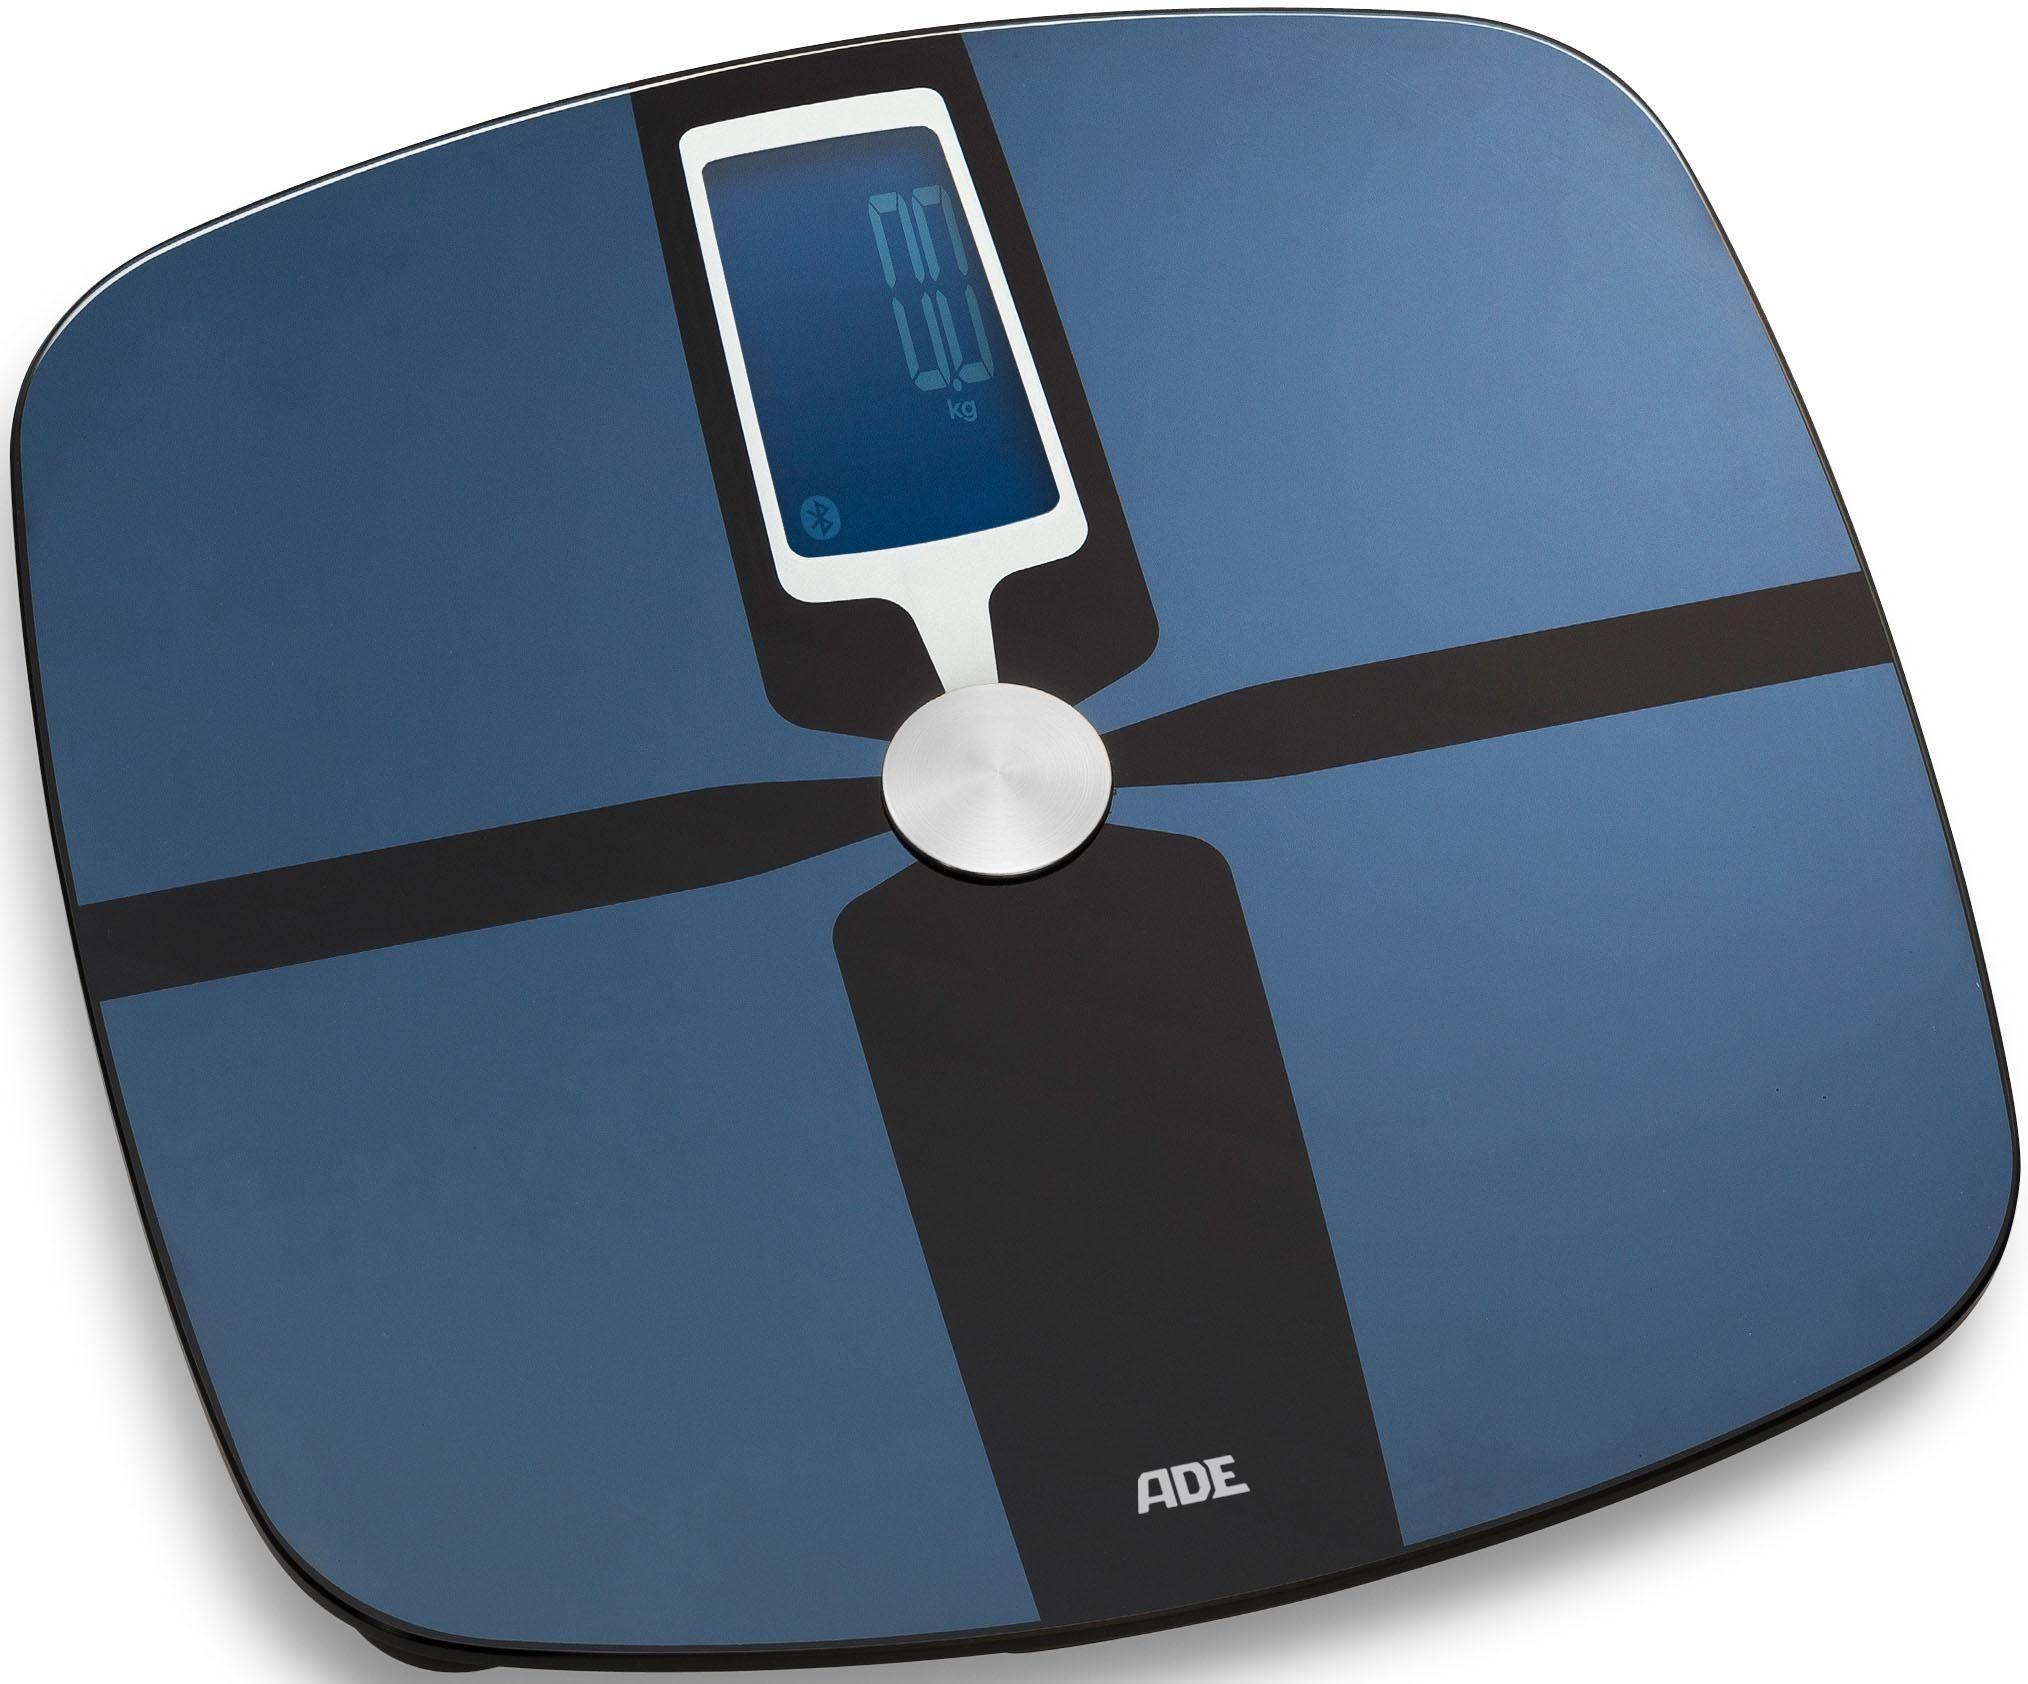 ADE Digitale Körperanalysewaage BA 1600 FITvigo